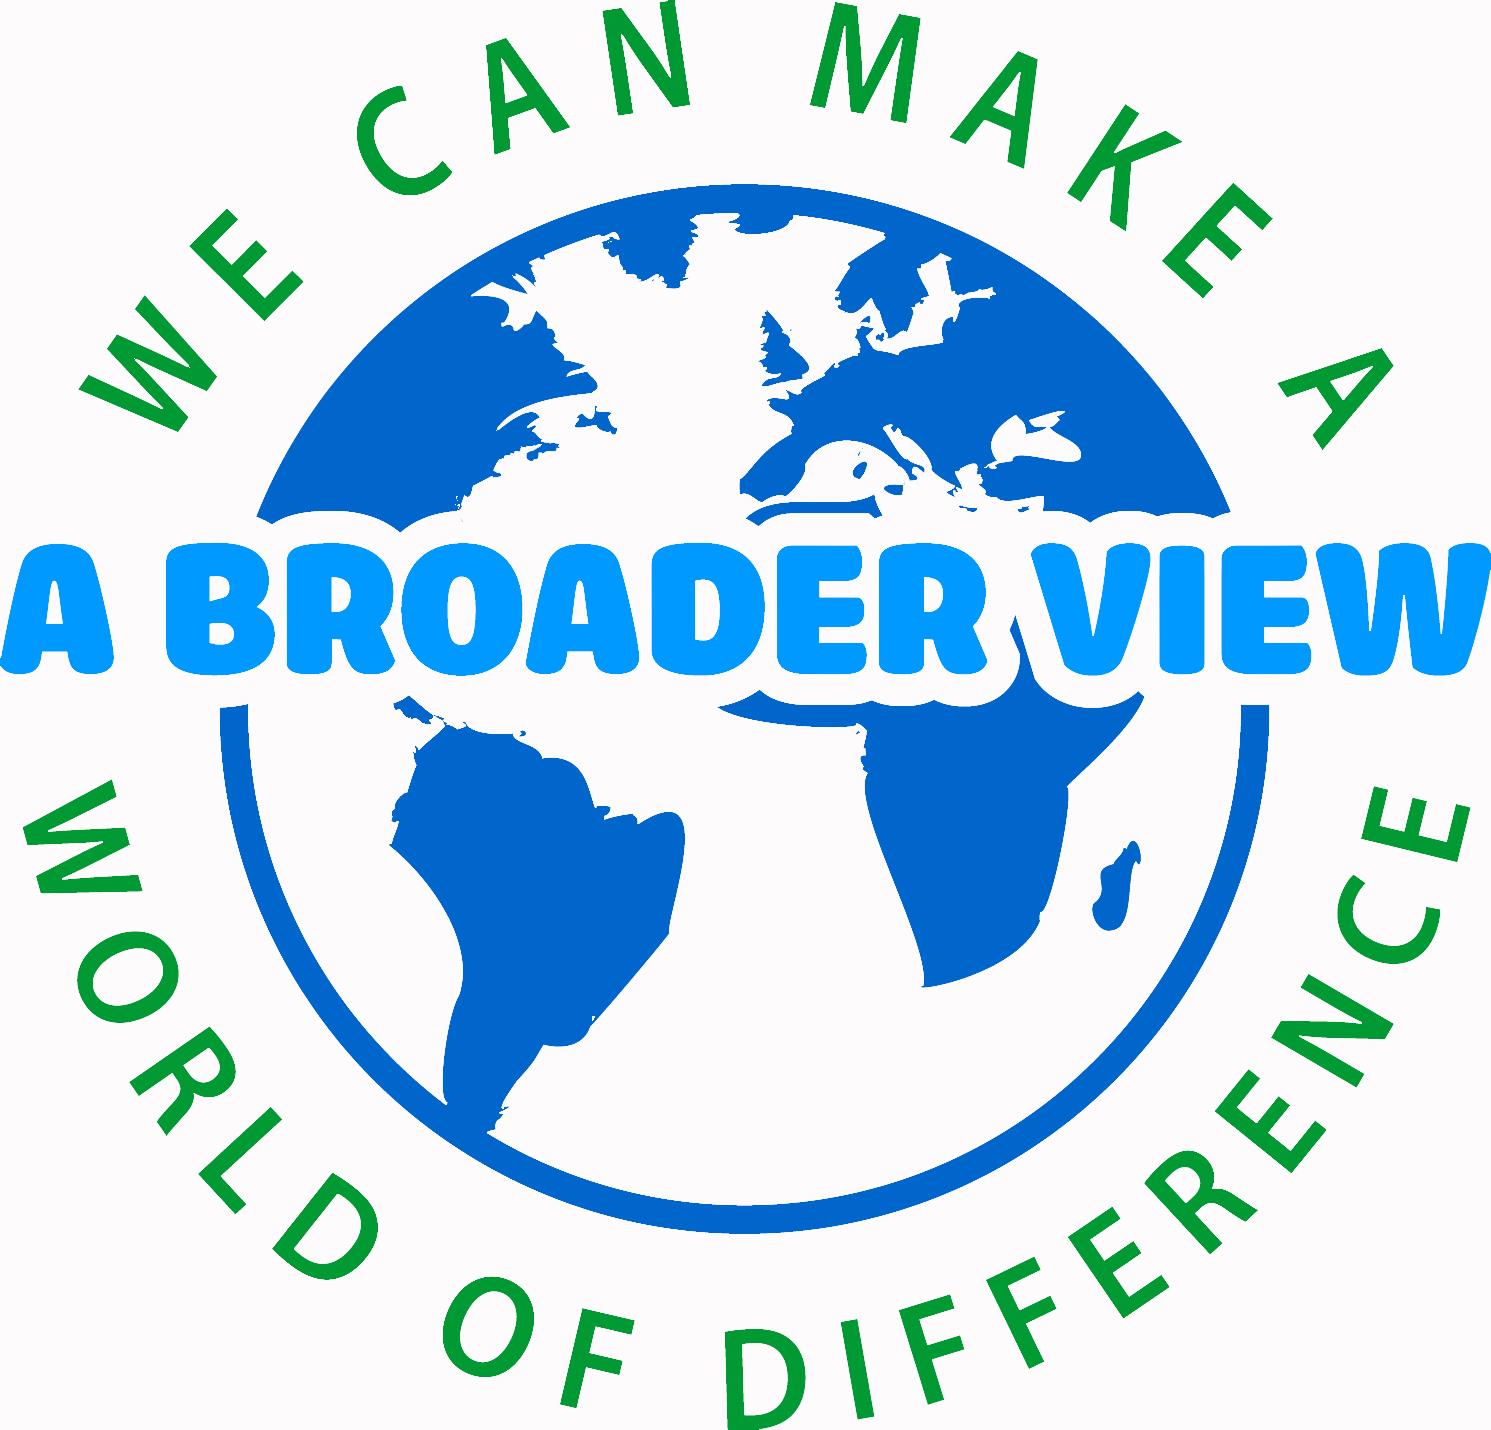 Volunteer in Costa Rica with A Broader View Volunteers